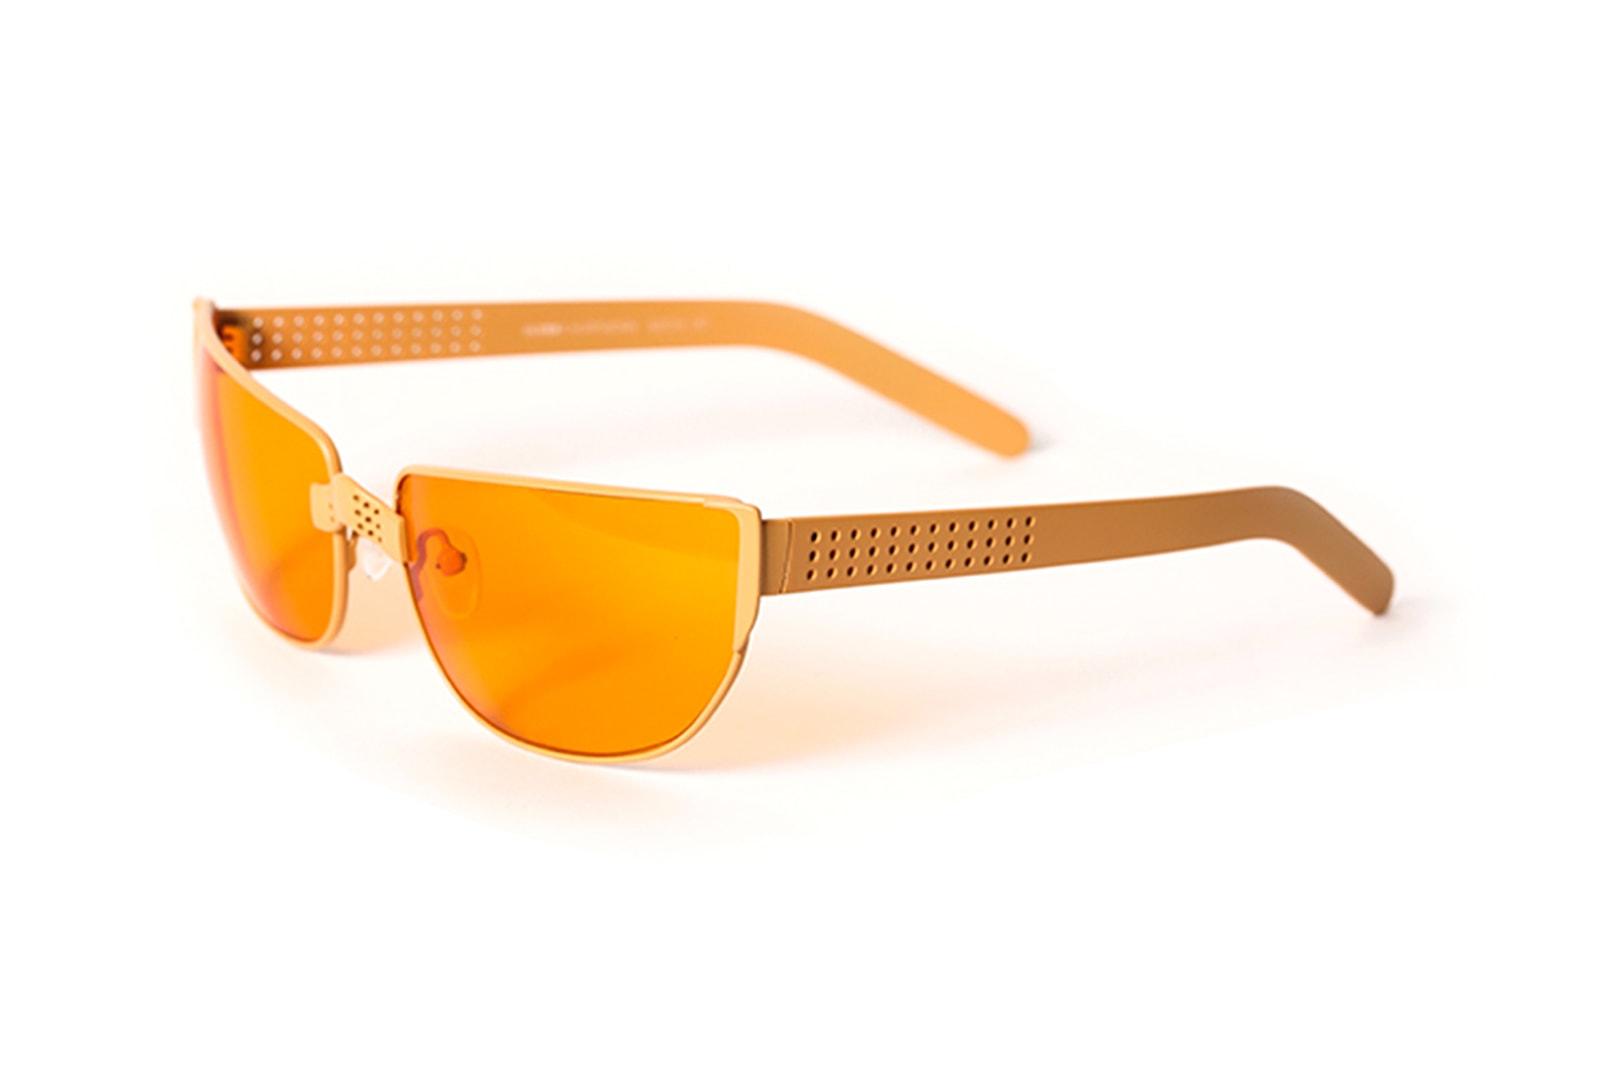 Uglyworldwide Jazzelle Zanaughtti x CHRISHABANA x GLVSS Sunglasses Collection Collaboration